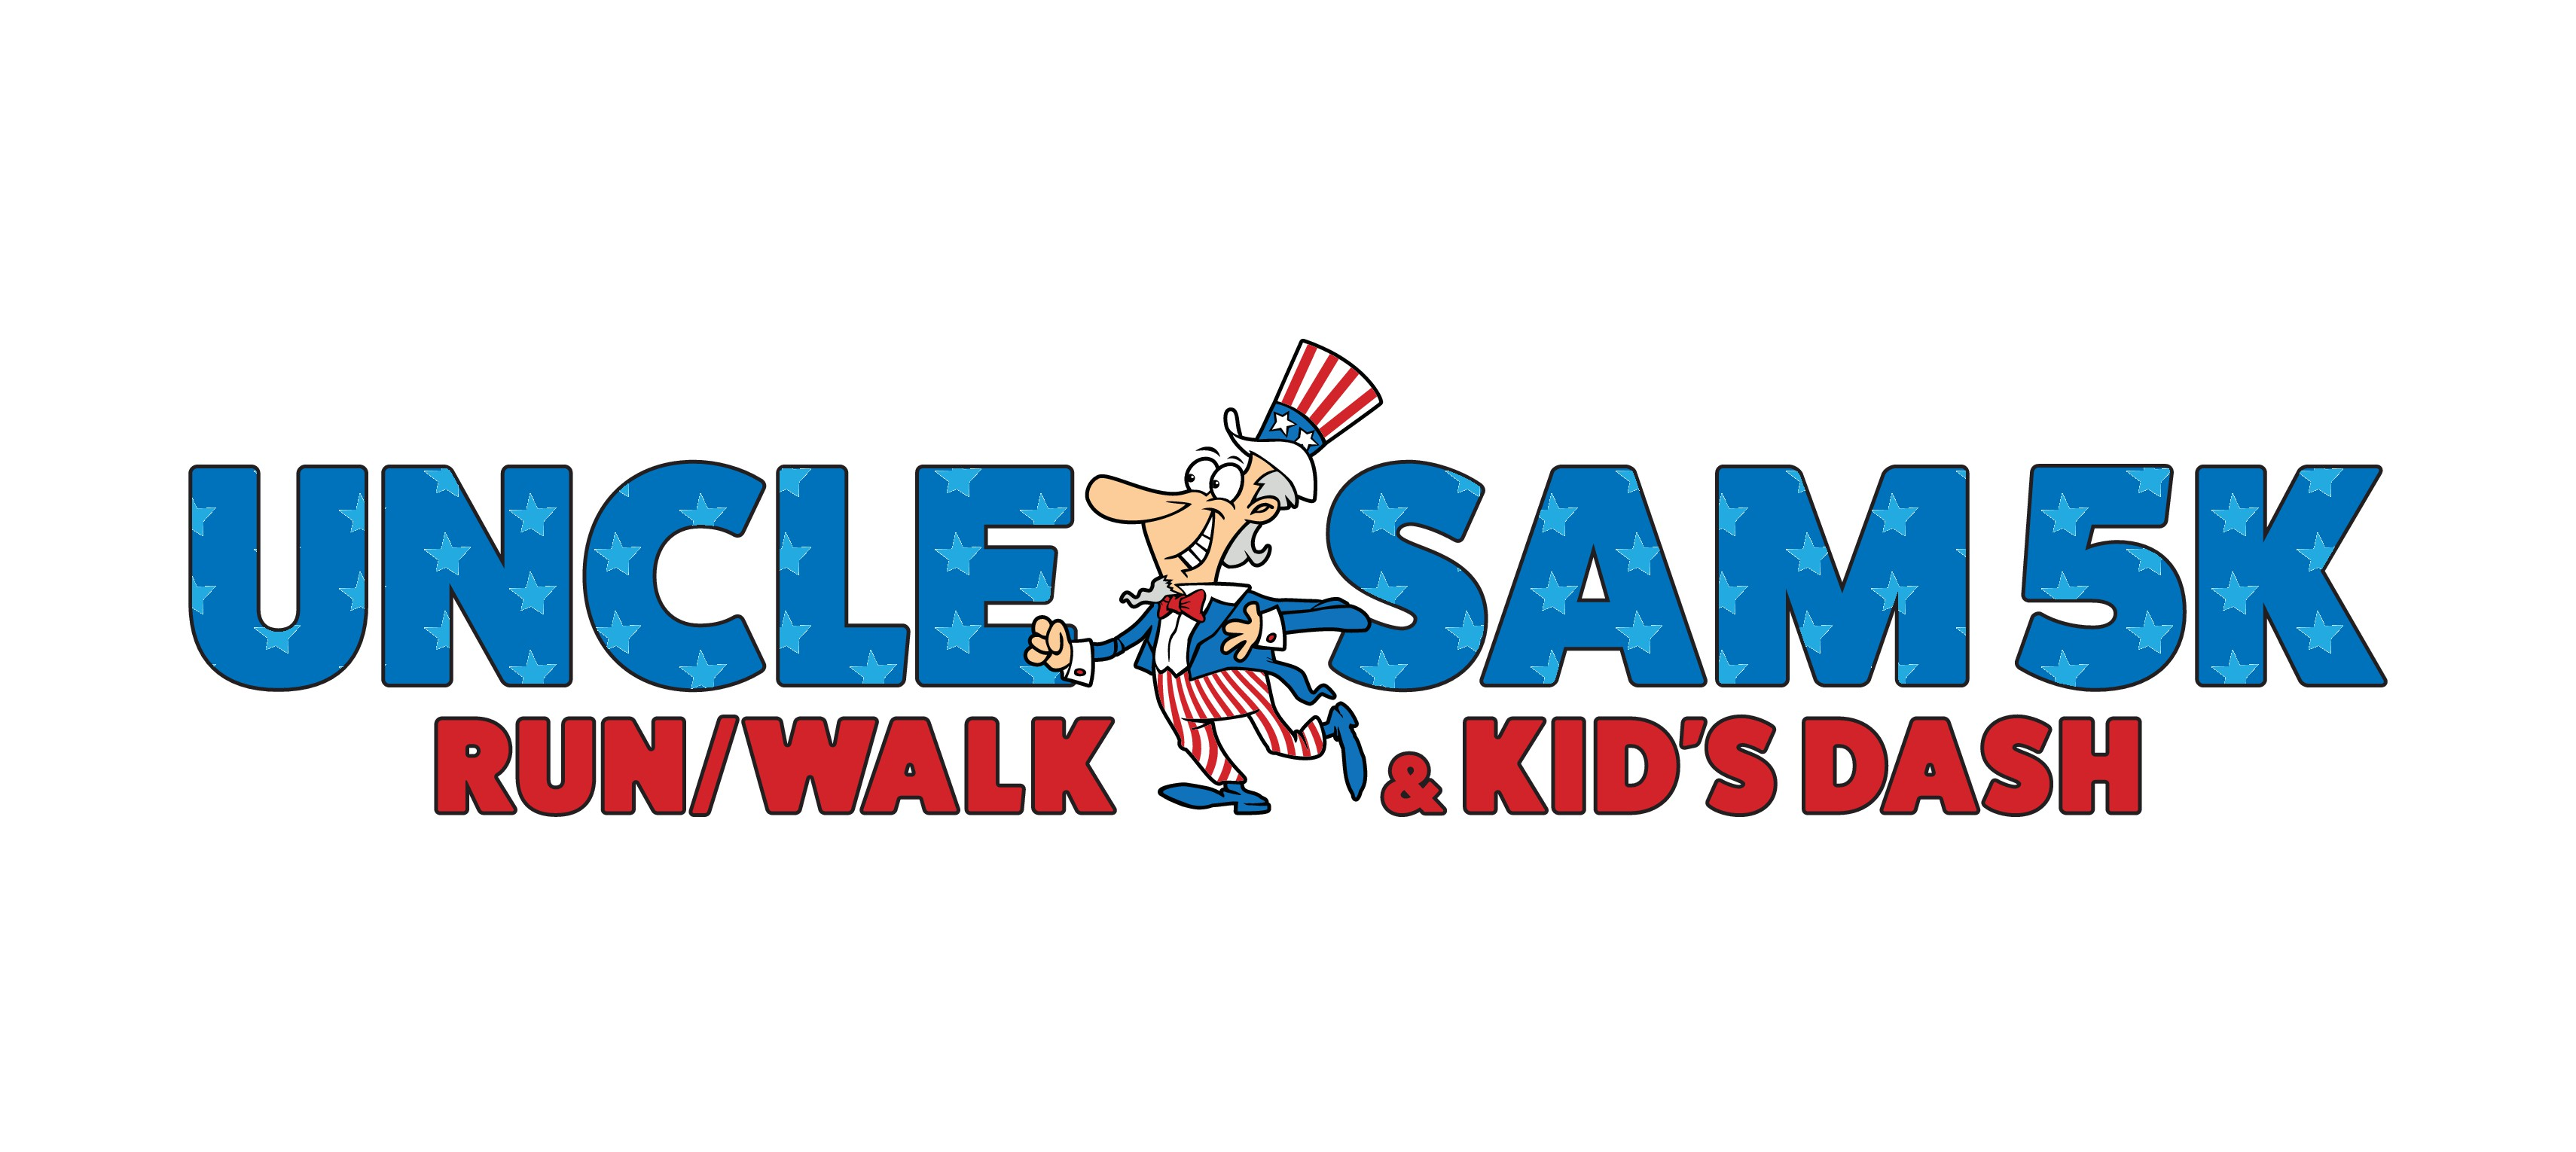 5k race uncle sam 5k kids dash tap house grill palatine il united states on 02 july 2017 race calendarcom